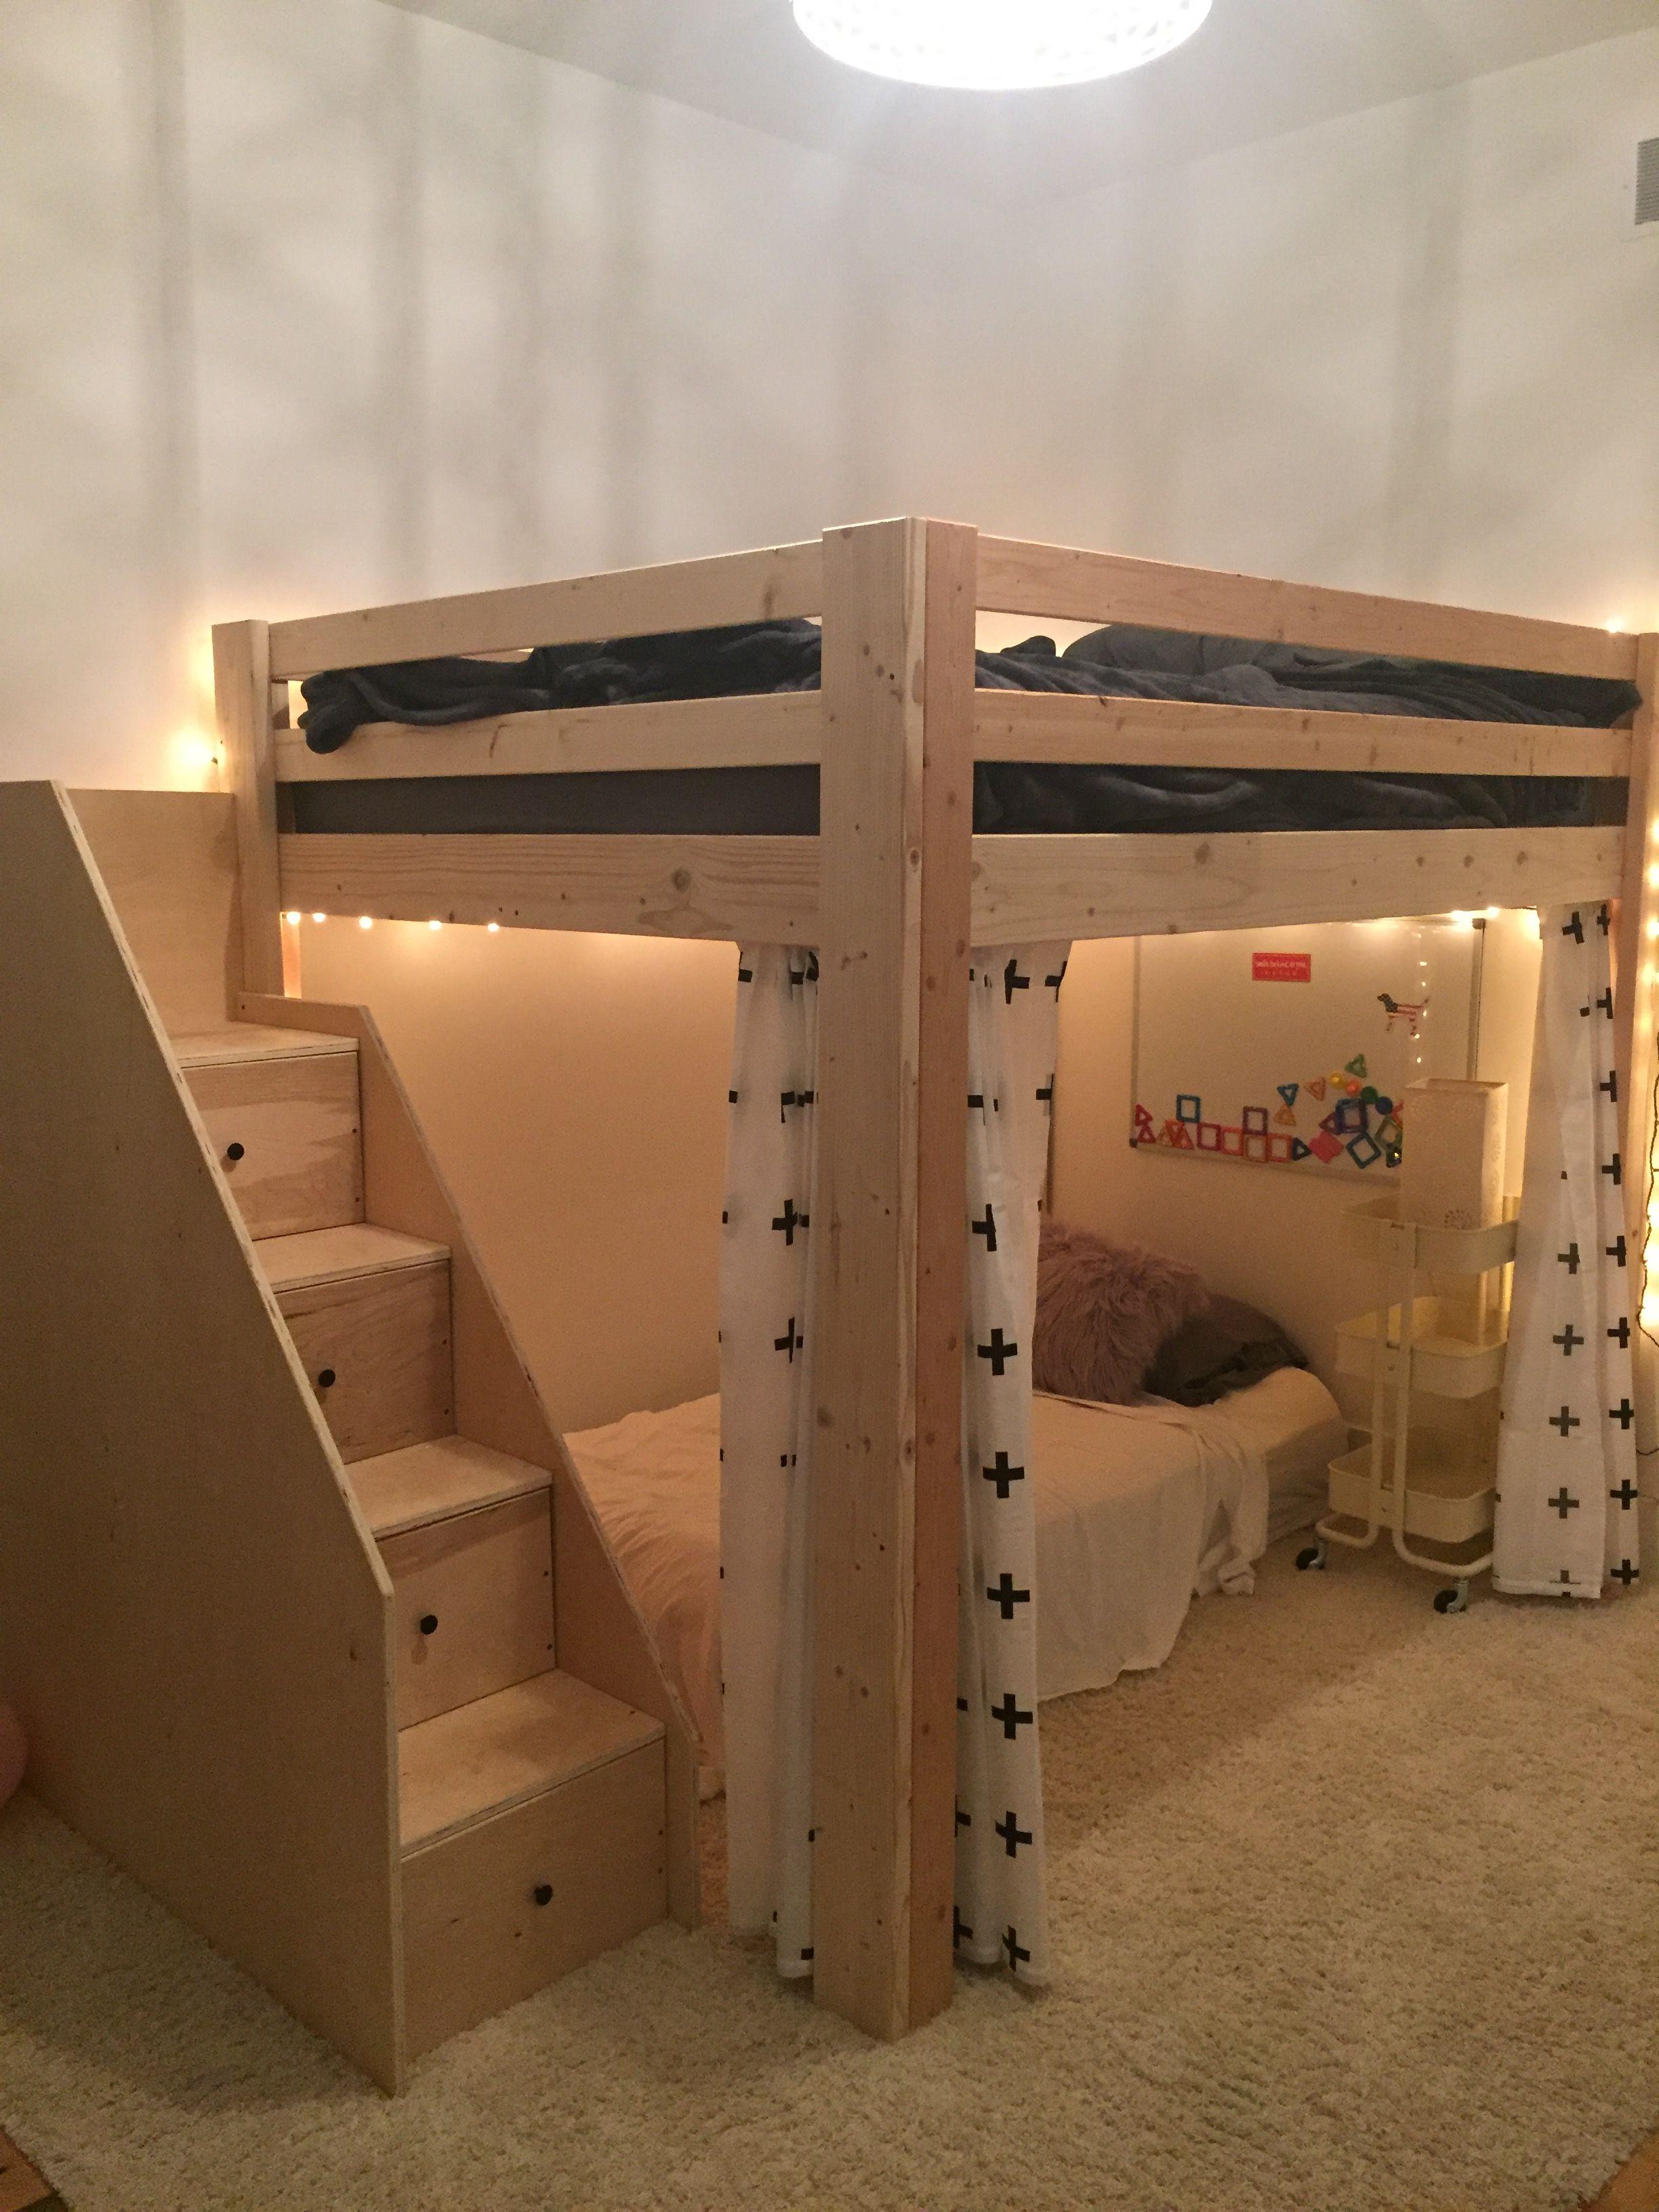 Loft Bed Diy Loft Bed Loft Bed Plans Loft Beds For Small Rooms Loft beds for small spaces